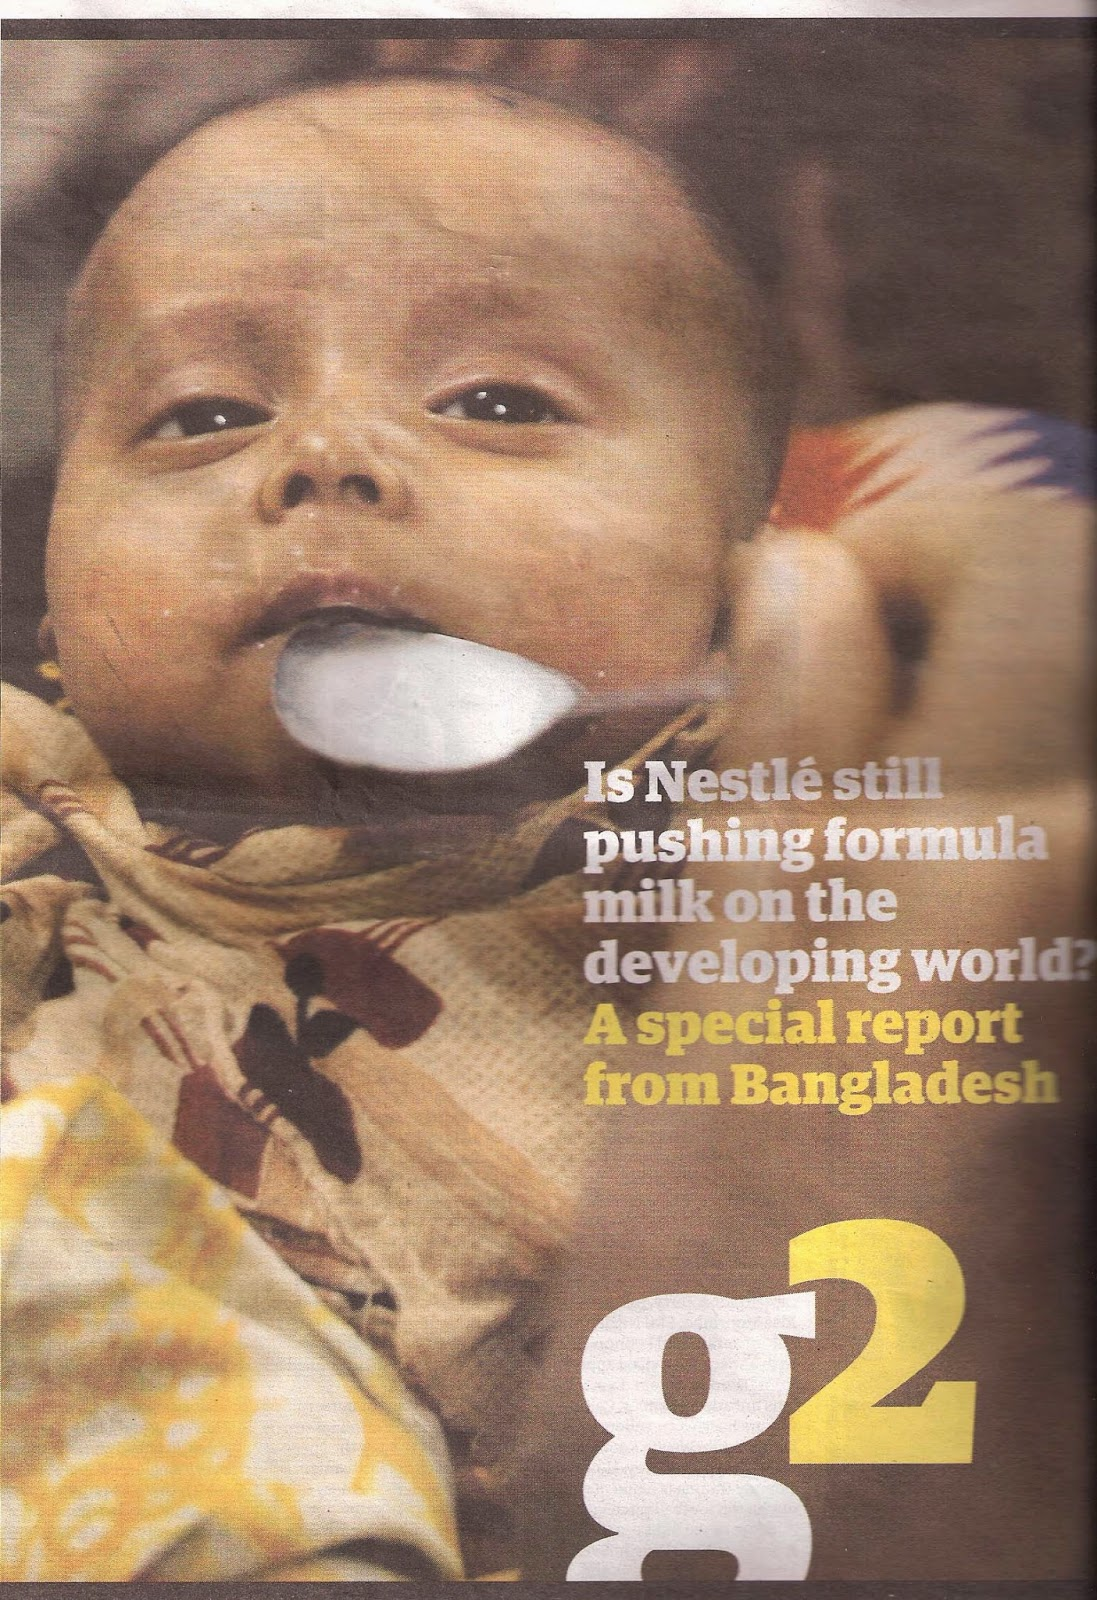 nestle baby formula controversy